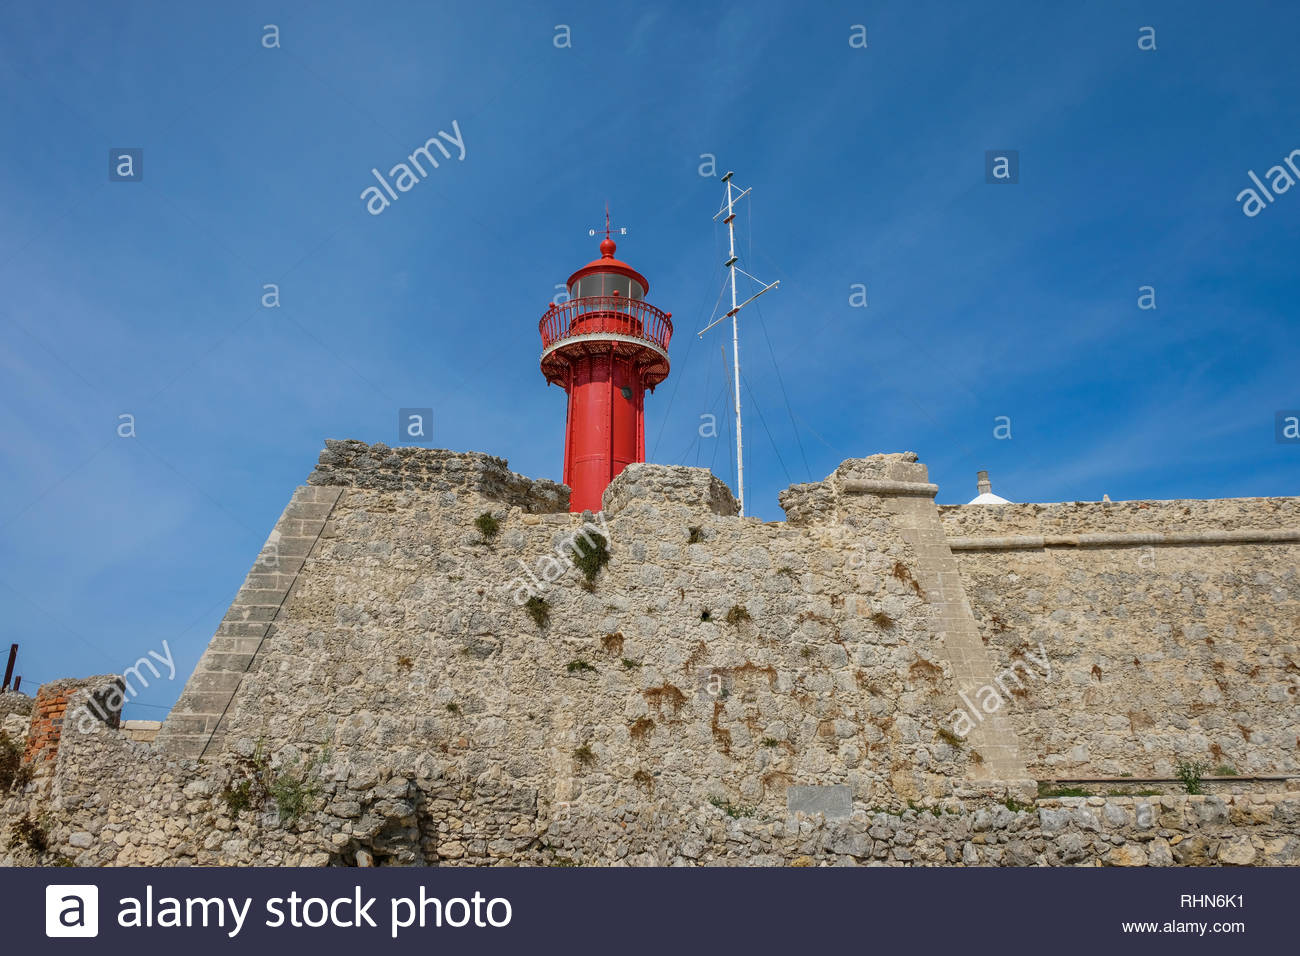 Lighthouse of Forte de Santa Catarina - Farol Forte de Santa Catarina -  Figueira da Foz, Portugal - Stock Image